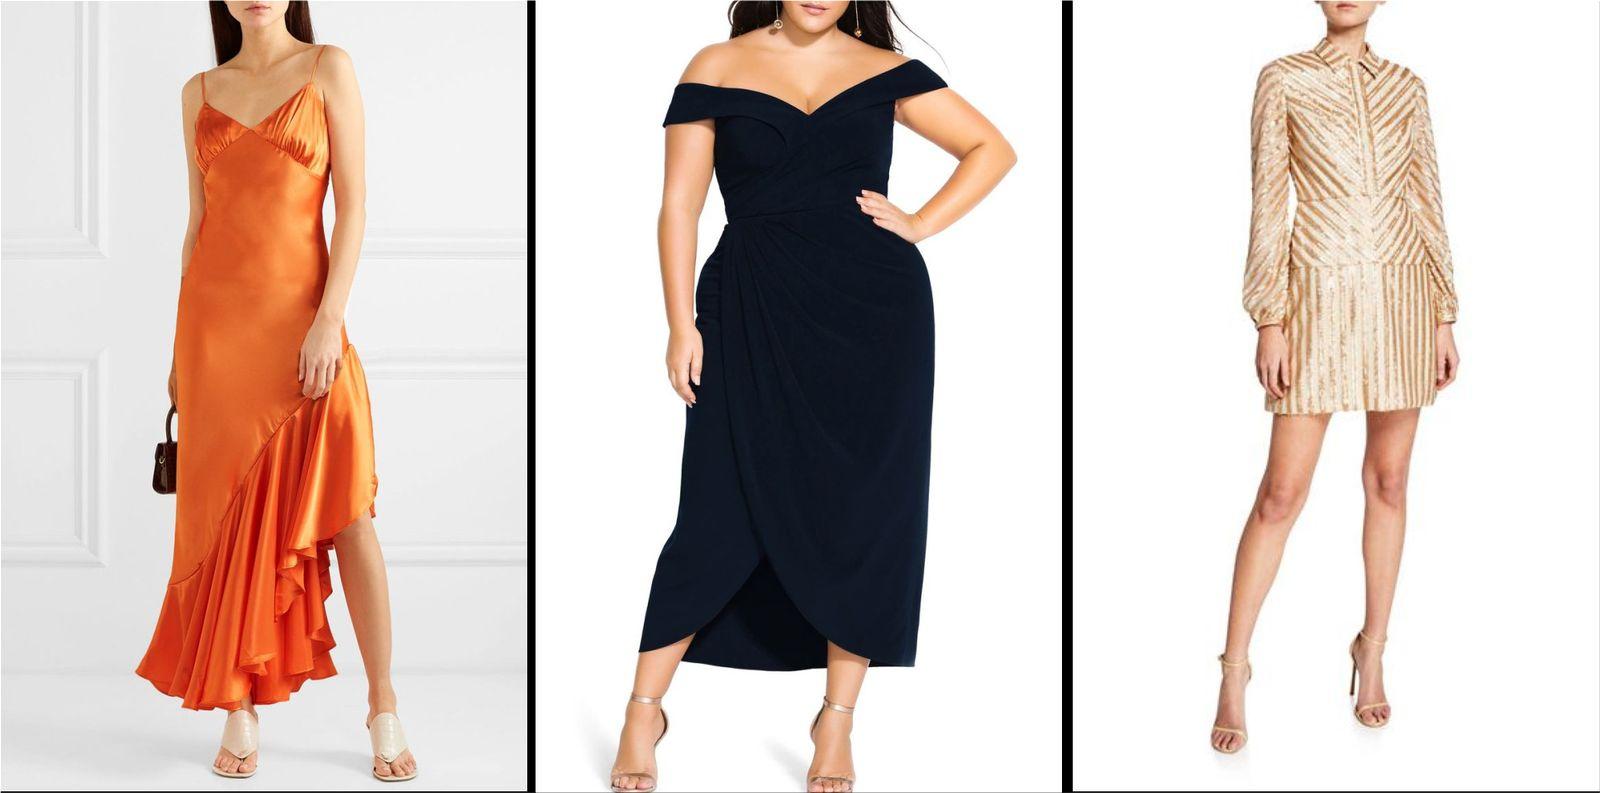 Elegant dresses to wear this fall